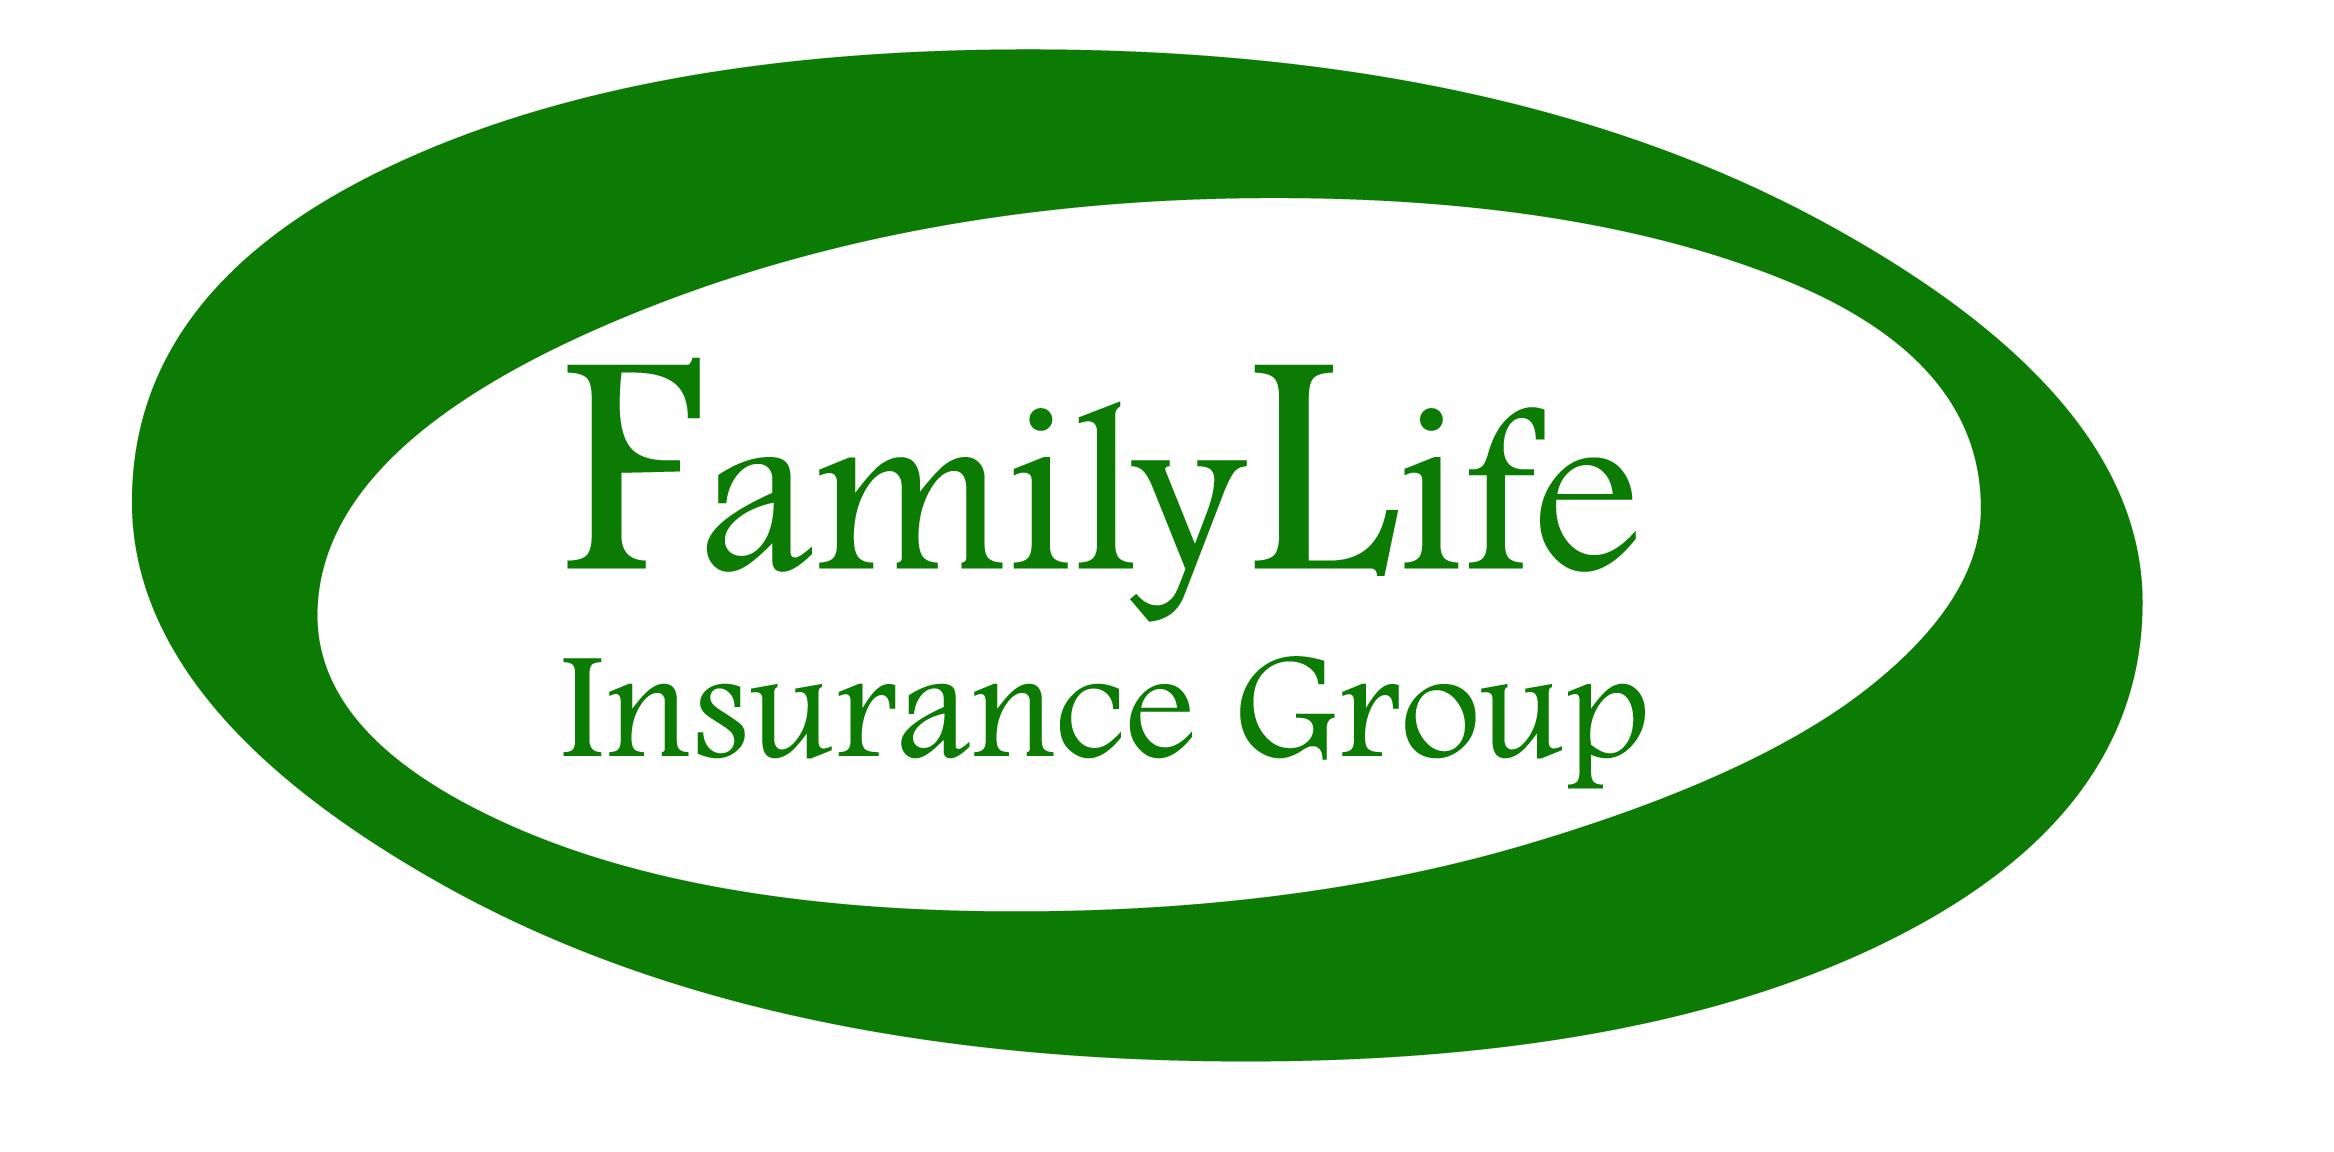 Life Insurance For Grandchildren - Why Life Insurance is ...